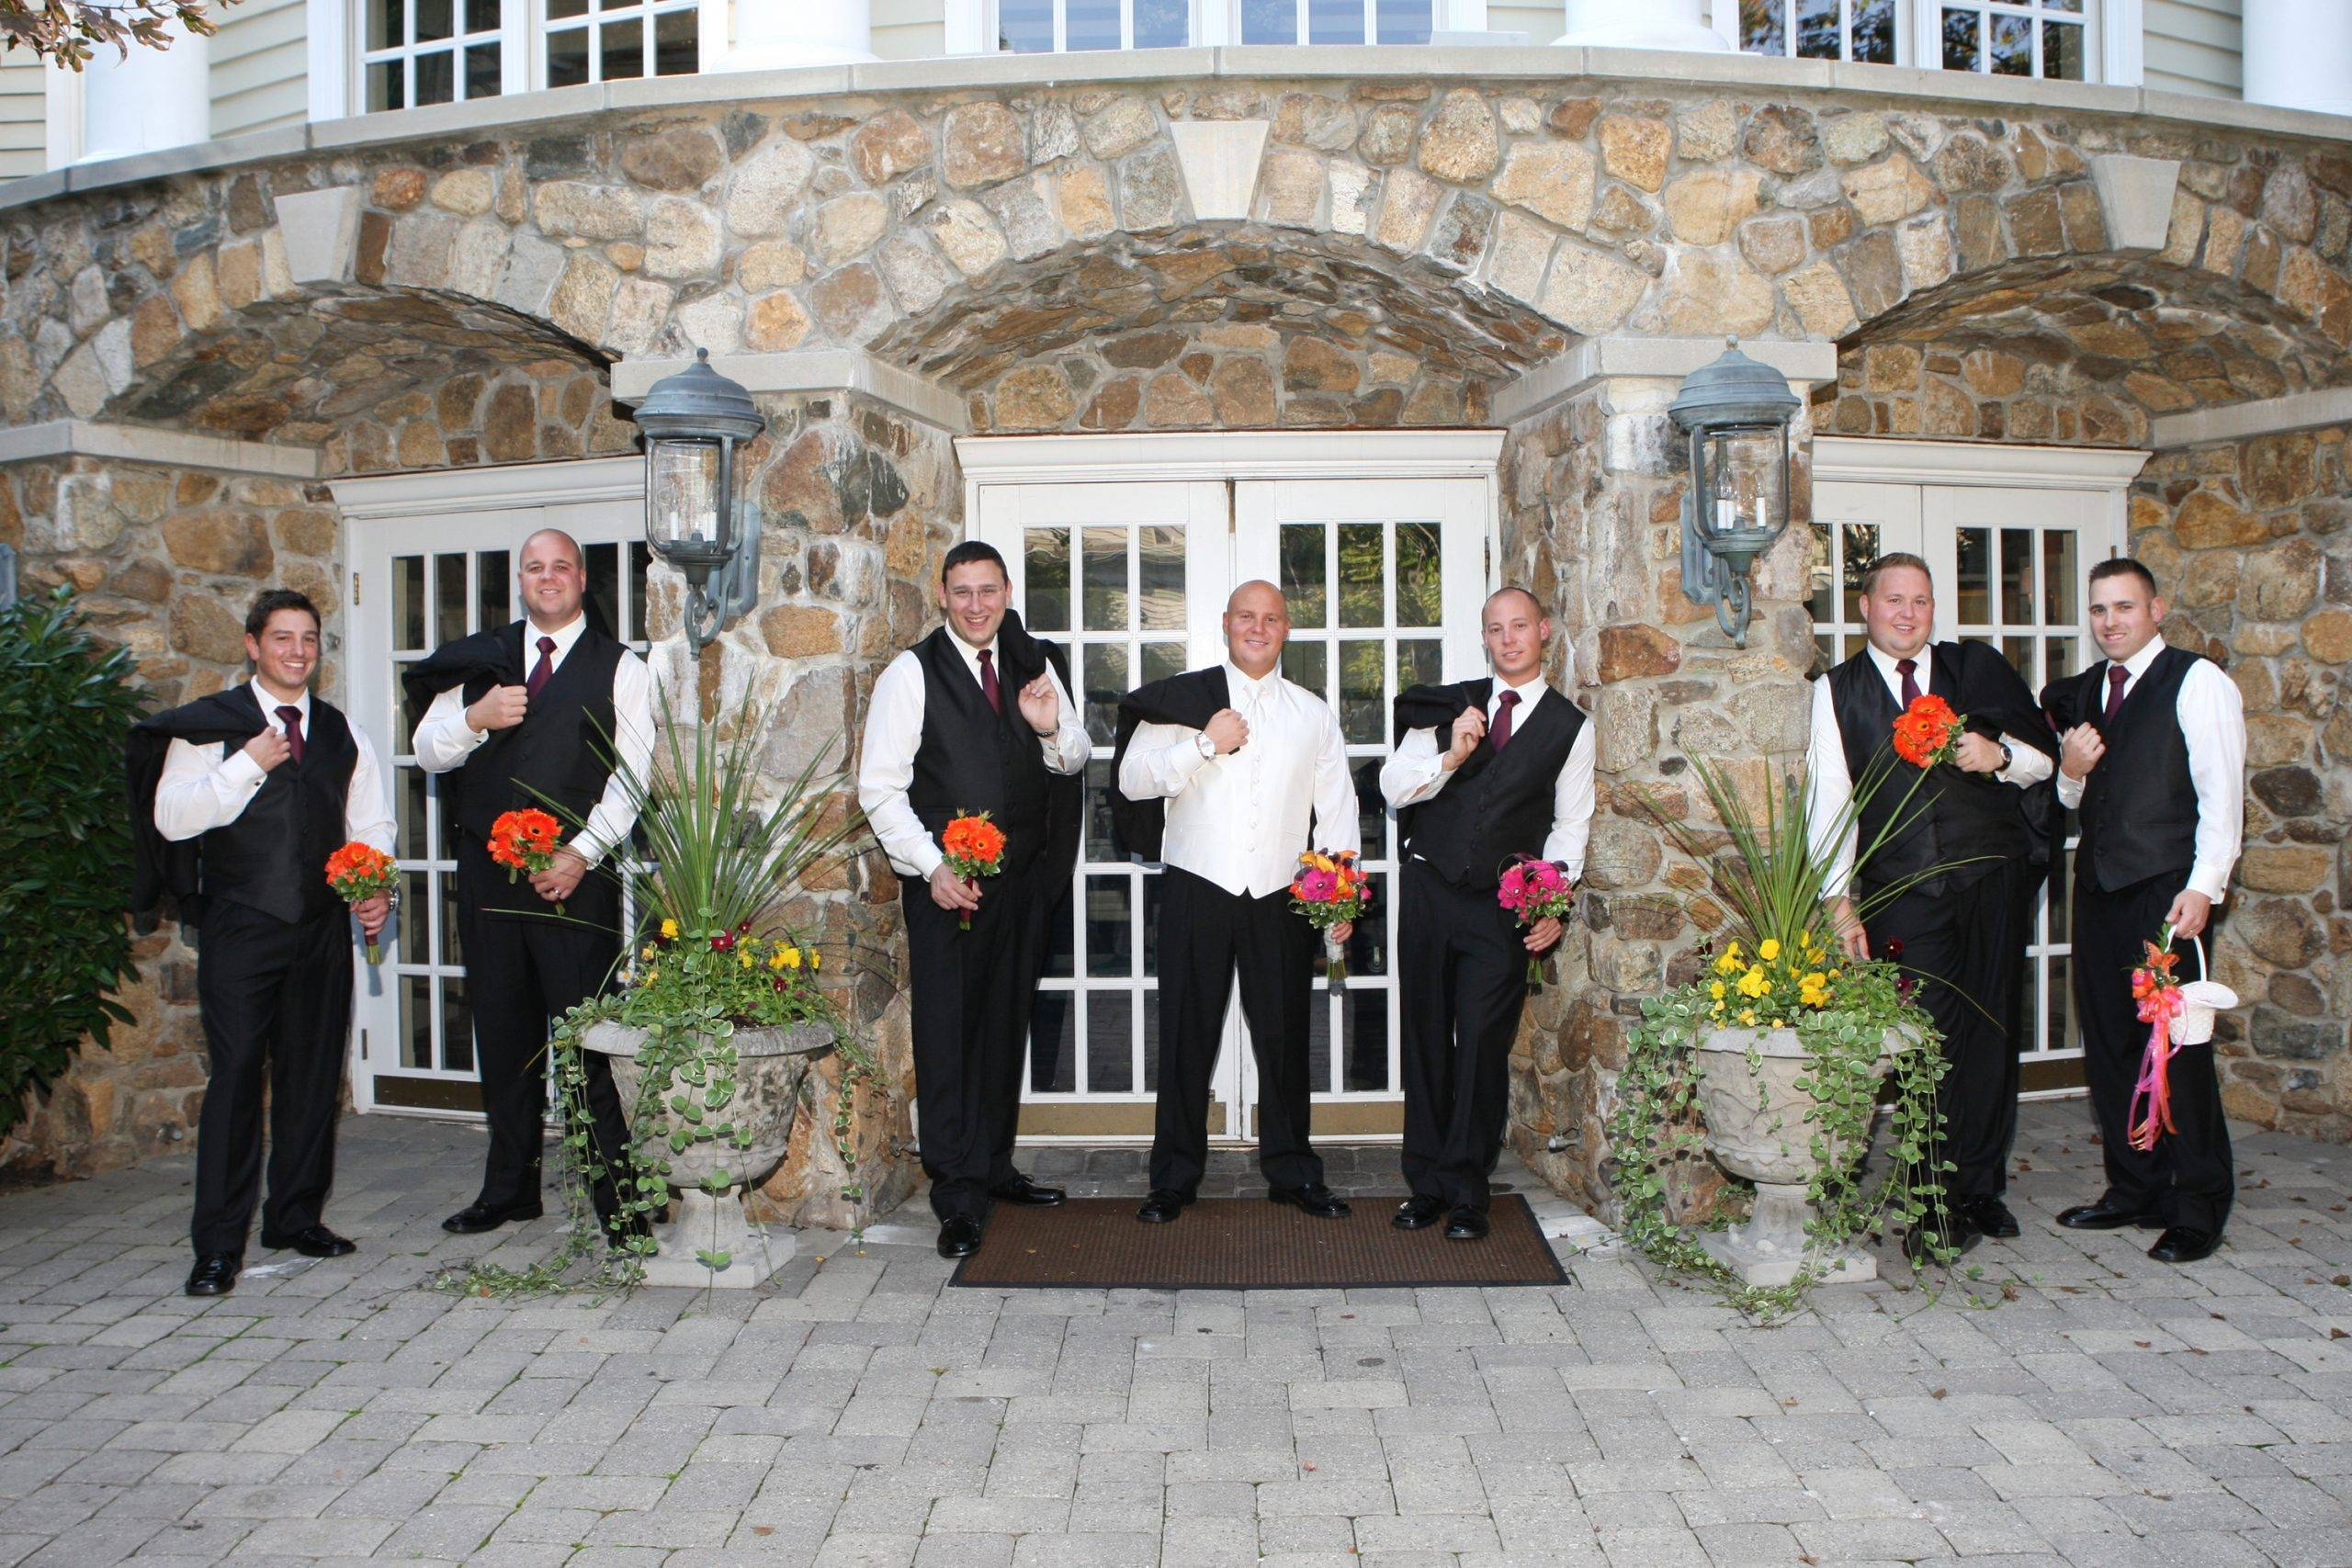 Olde Mill Inn groom with his groomsmen outside